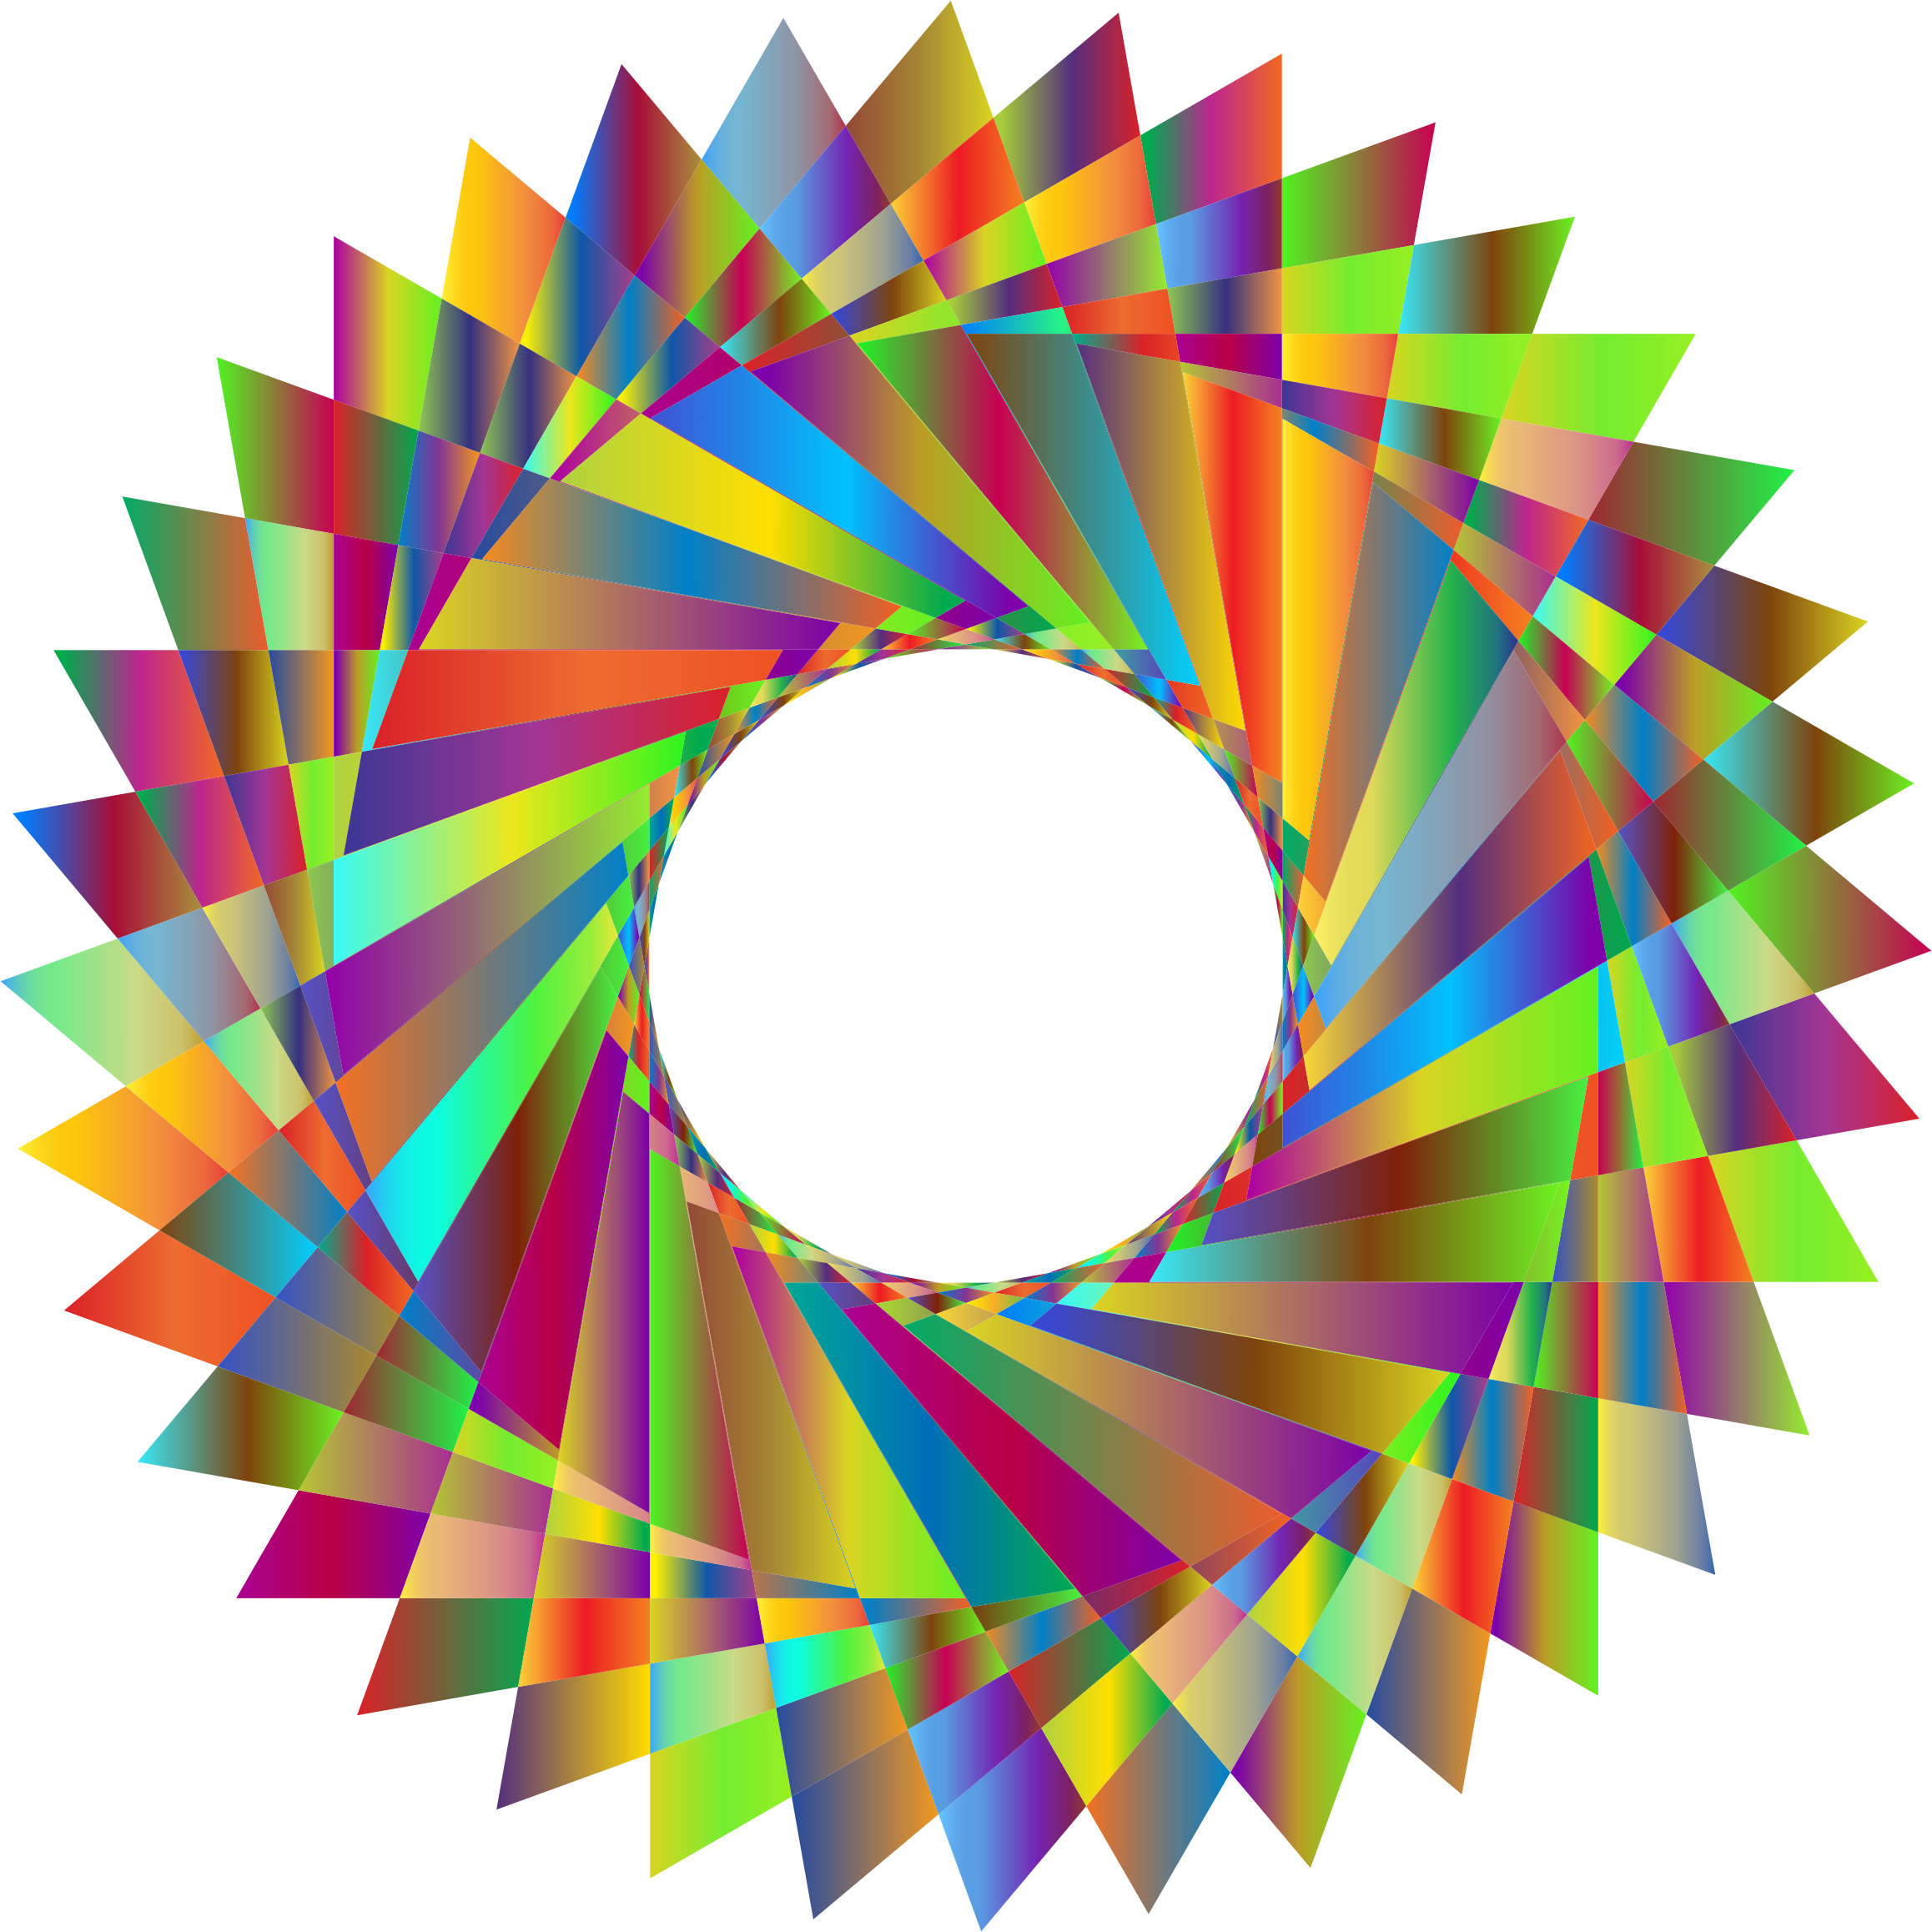 Geometry clipart preschool shape. Prismatic geometric icons png